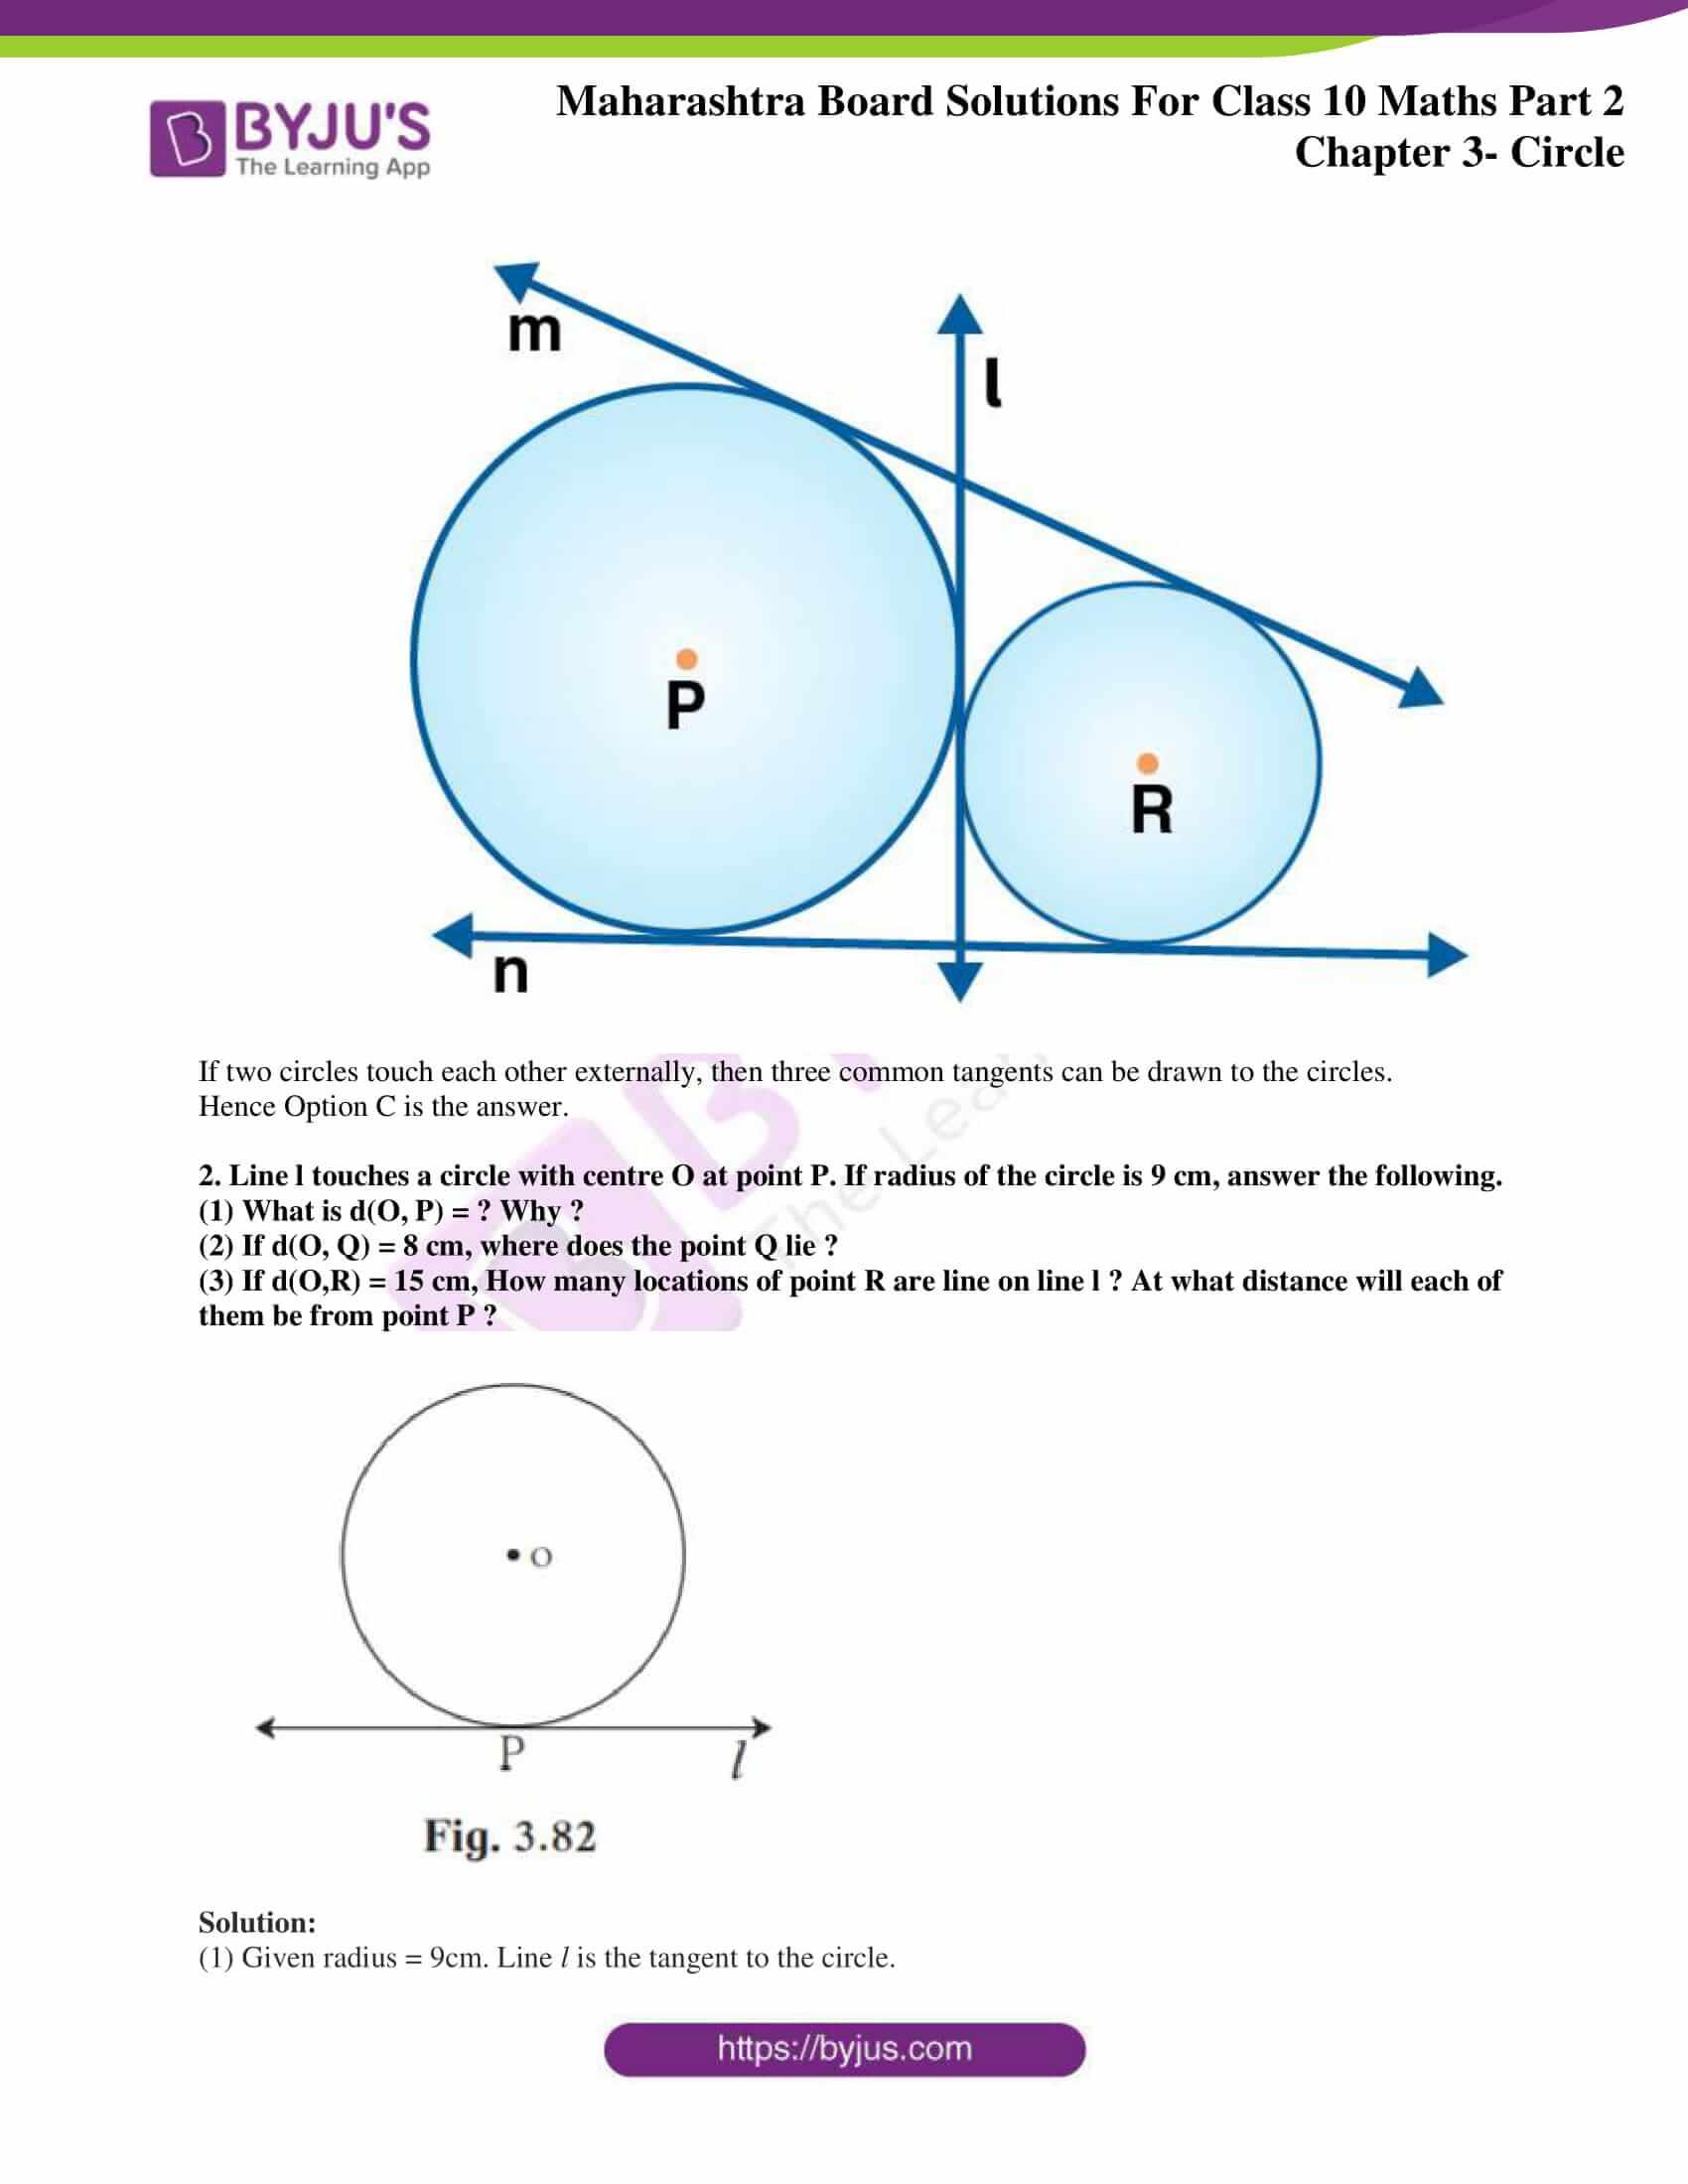 msbshse sol class 10 maths part 2 chapter 3 19